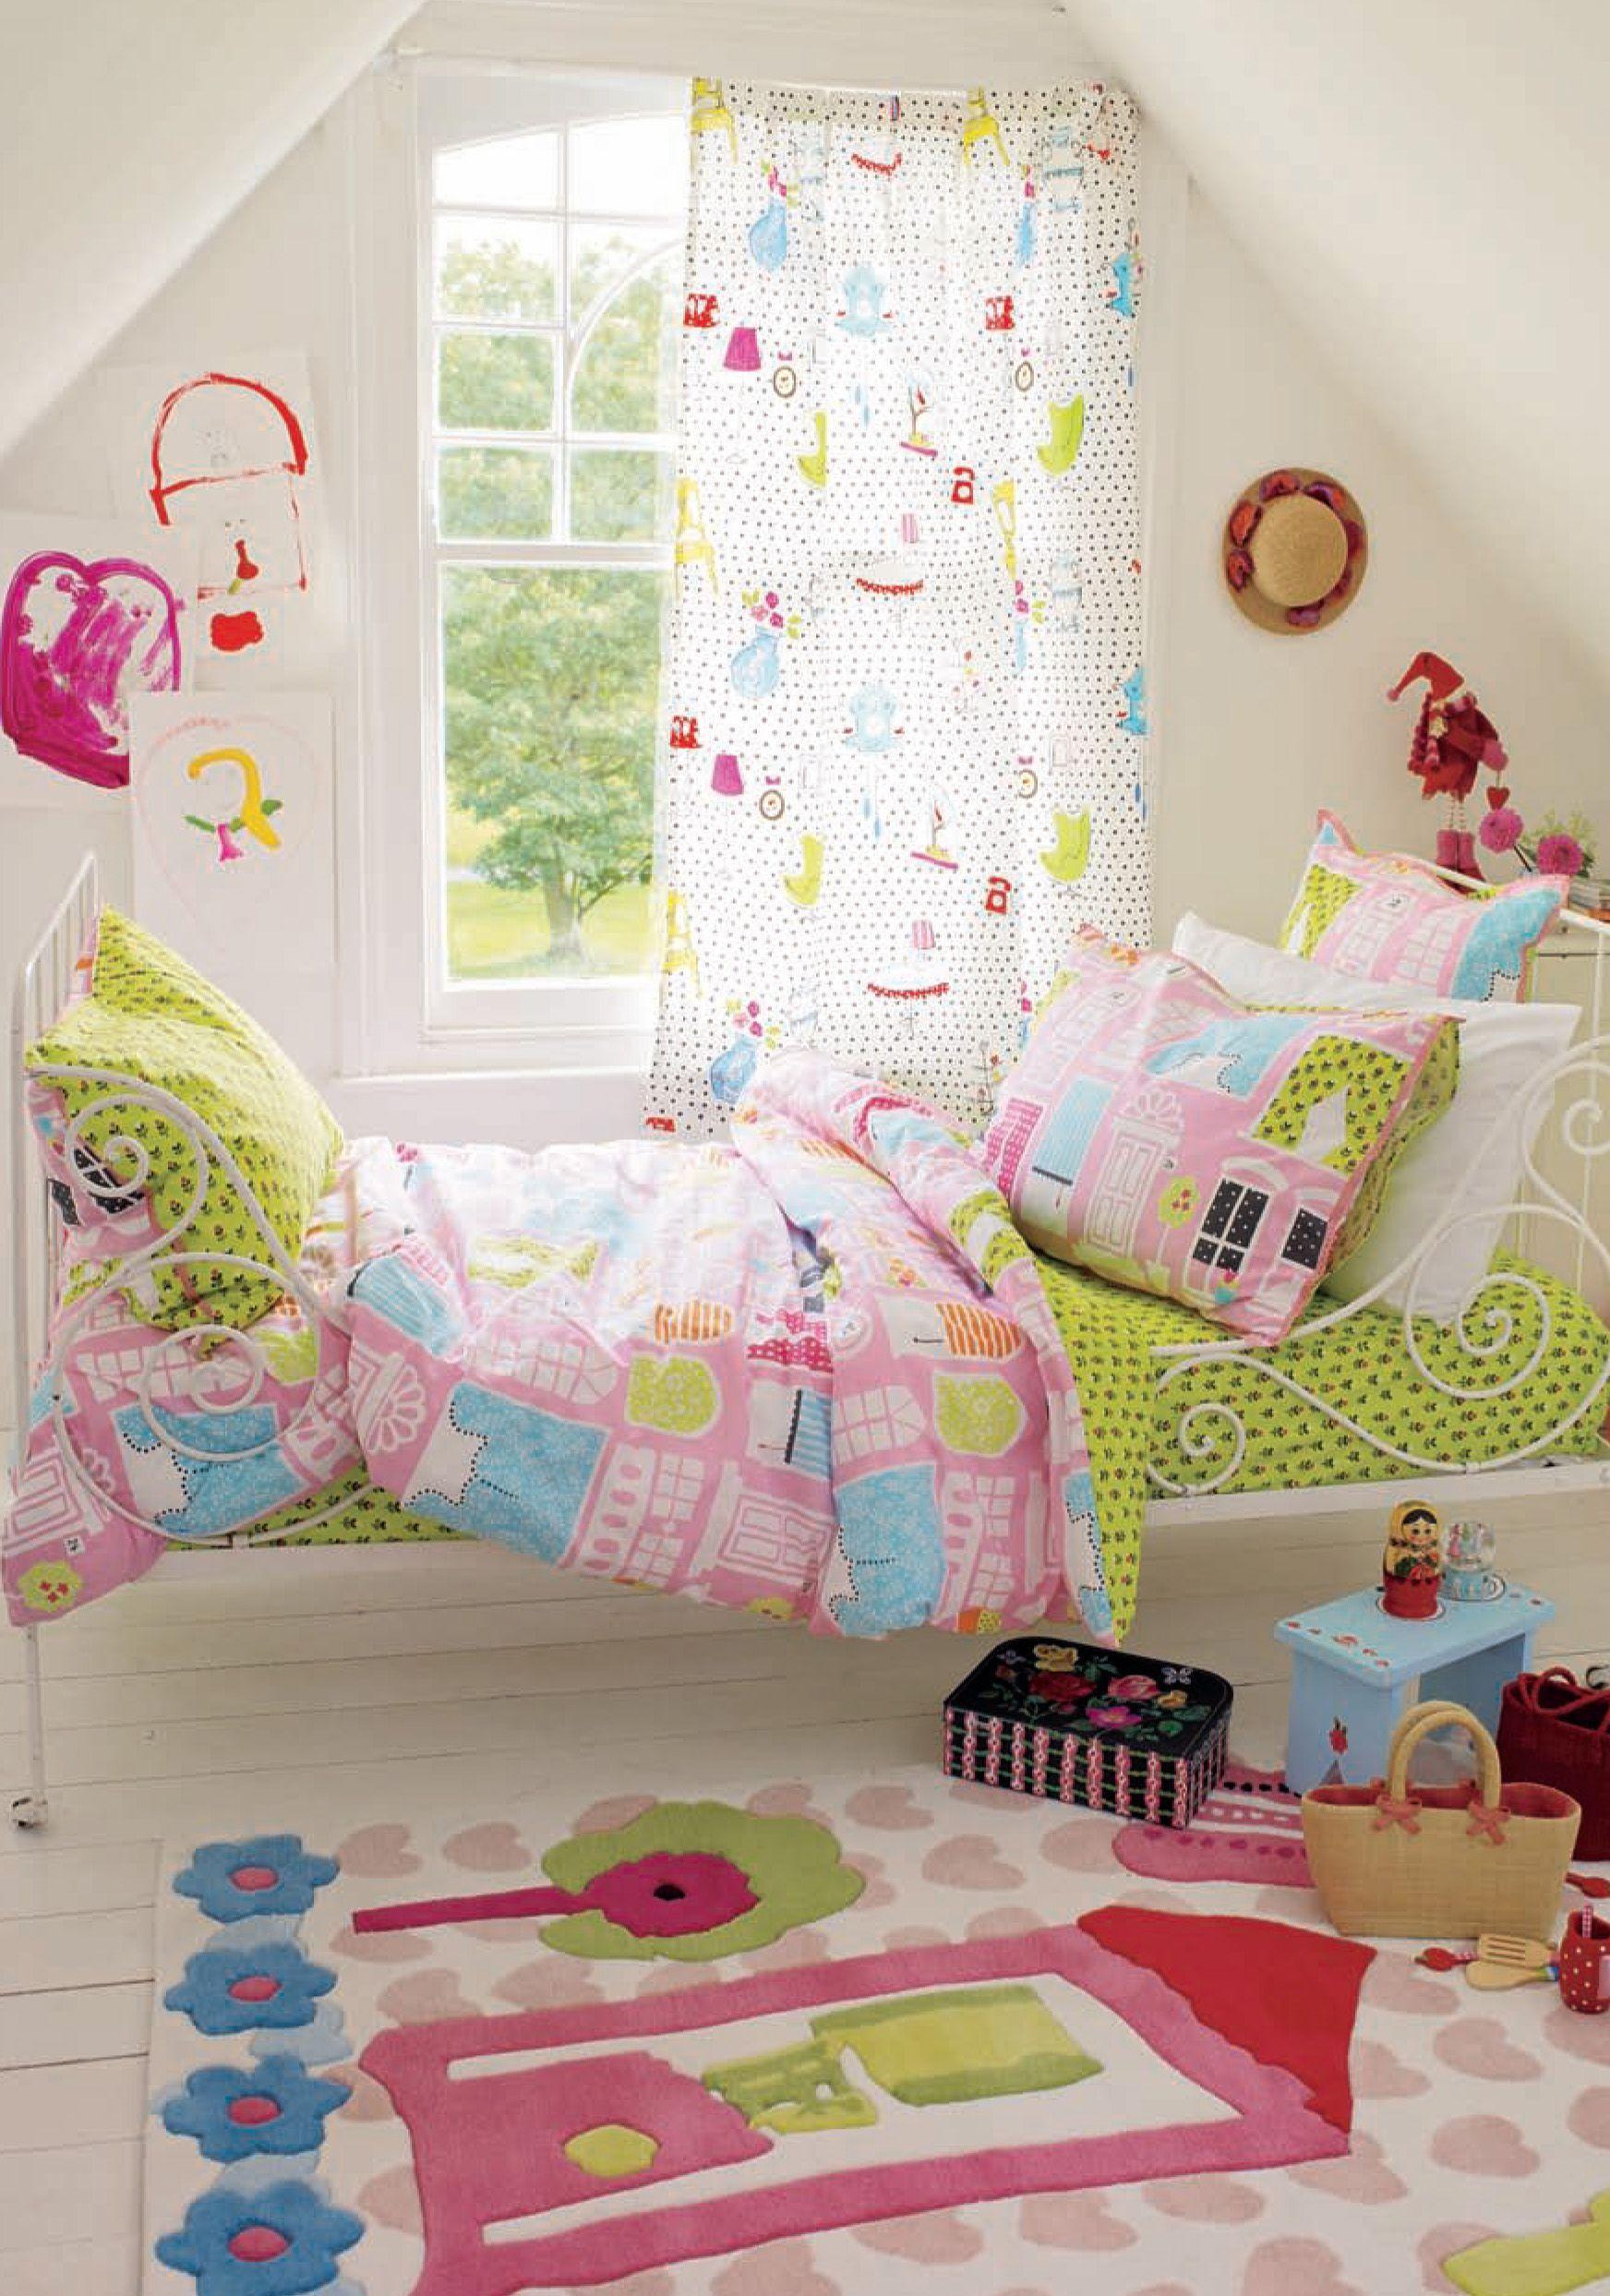 Lakanset Dolls House Designer Guild Textiles Ikea Minnen Bed